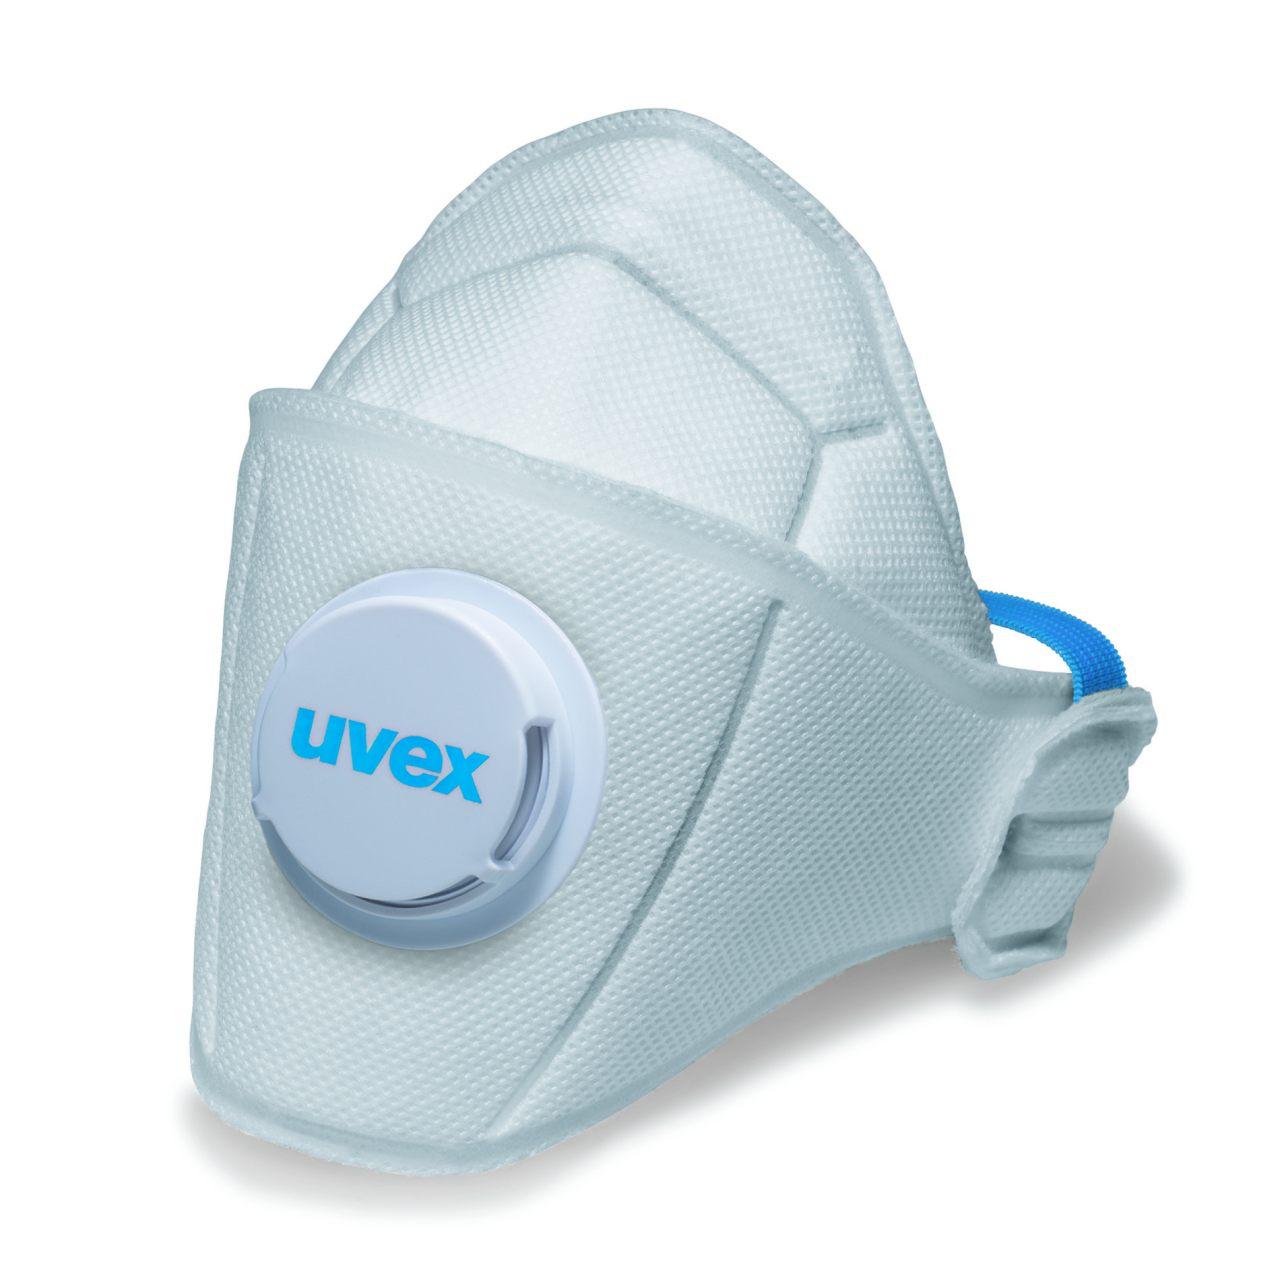 FFP1-Atemschutz-Faltmaske uvex silv-Air 5110 premium